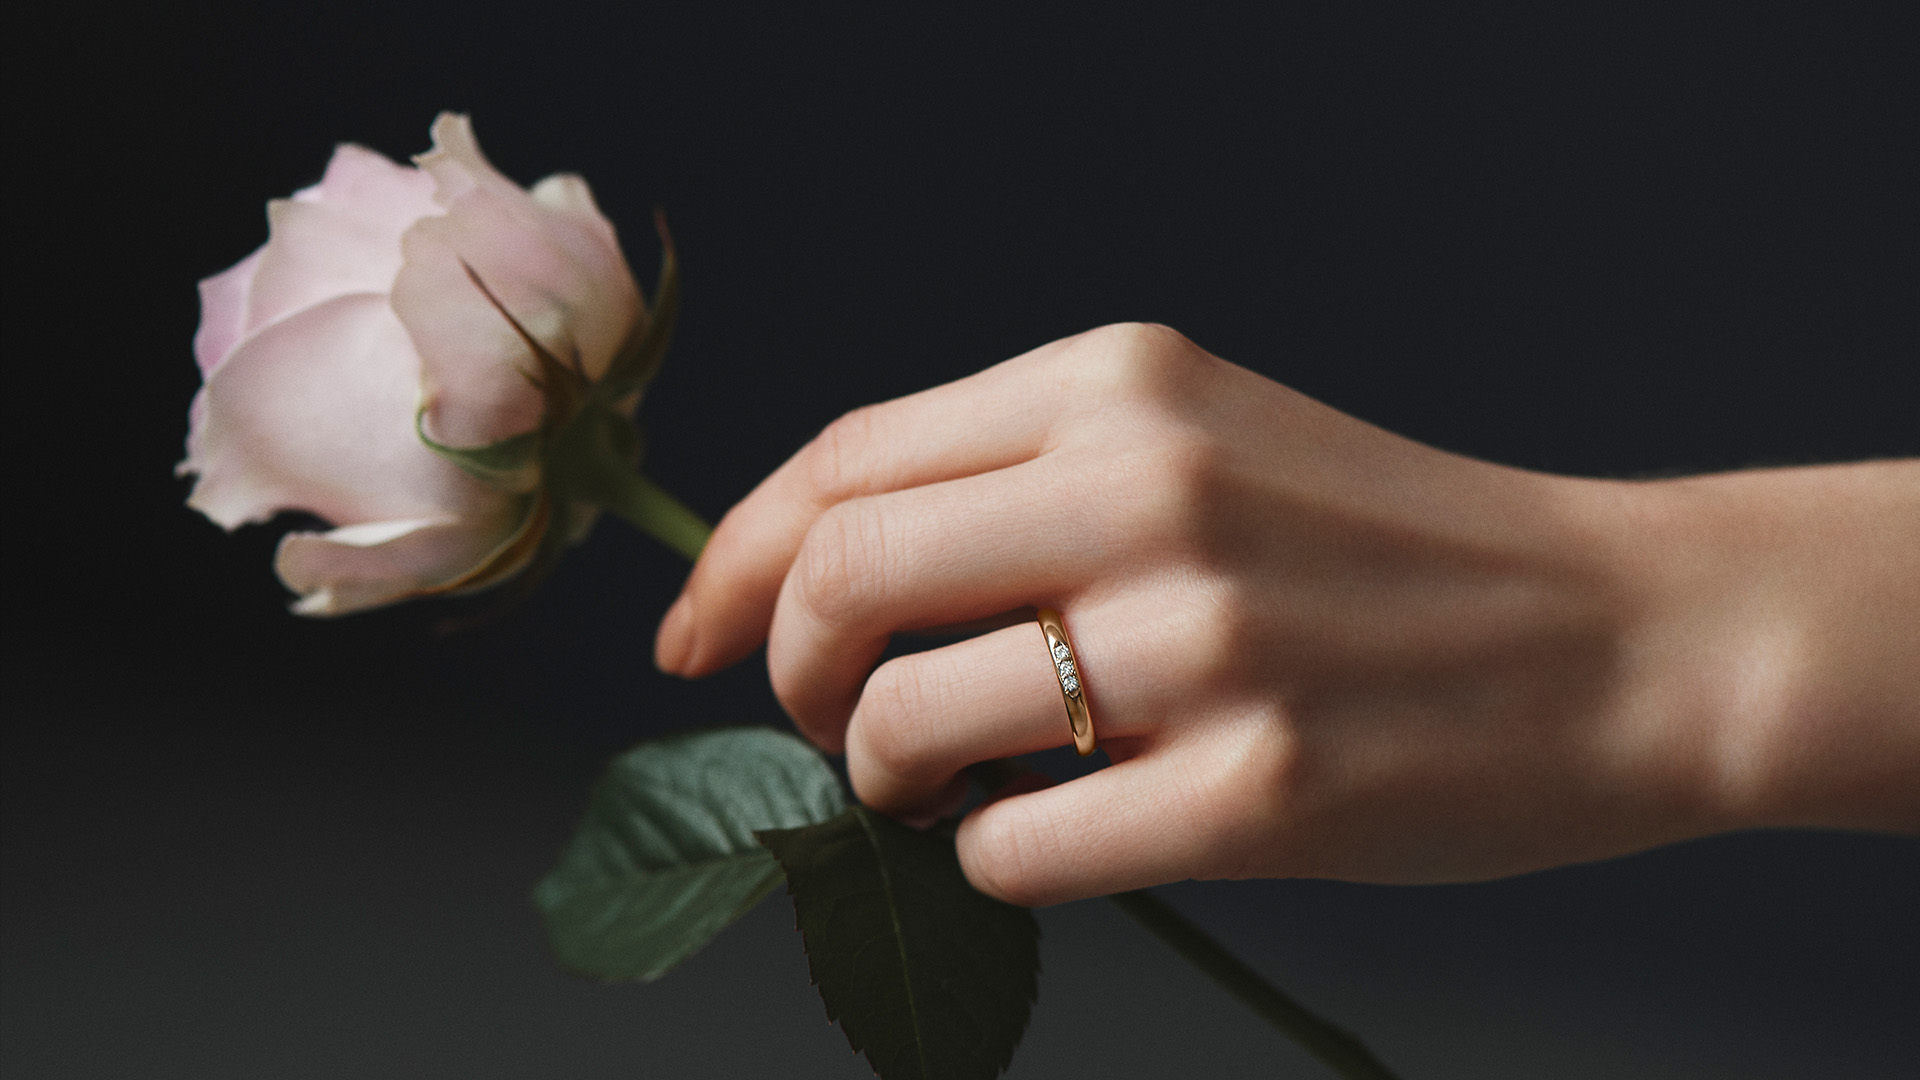 Origin Belief02 オリジンビリーフ02 | 結婚指輪サムネイル 4